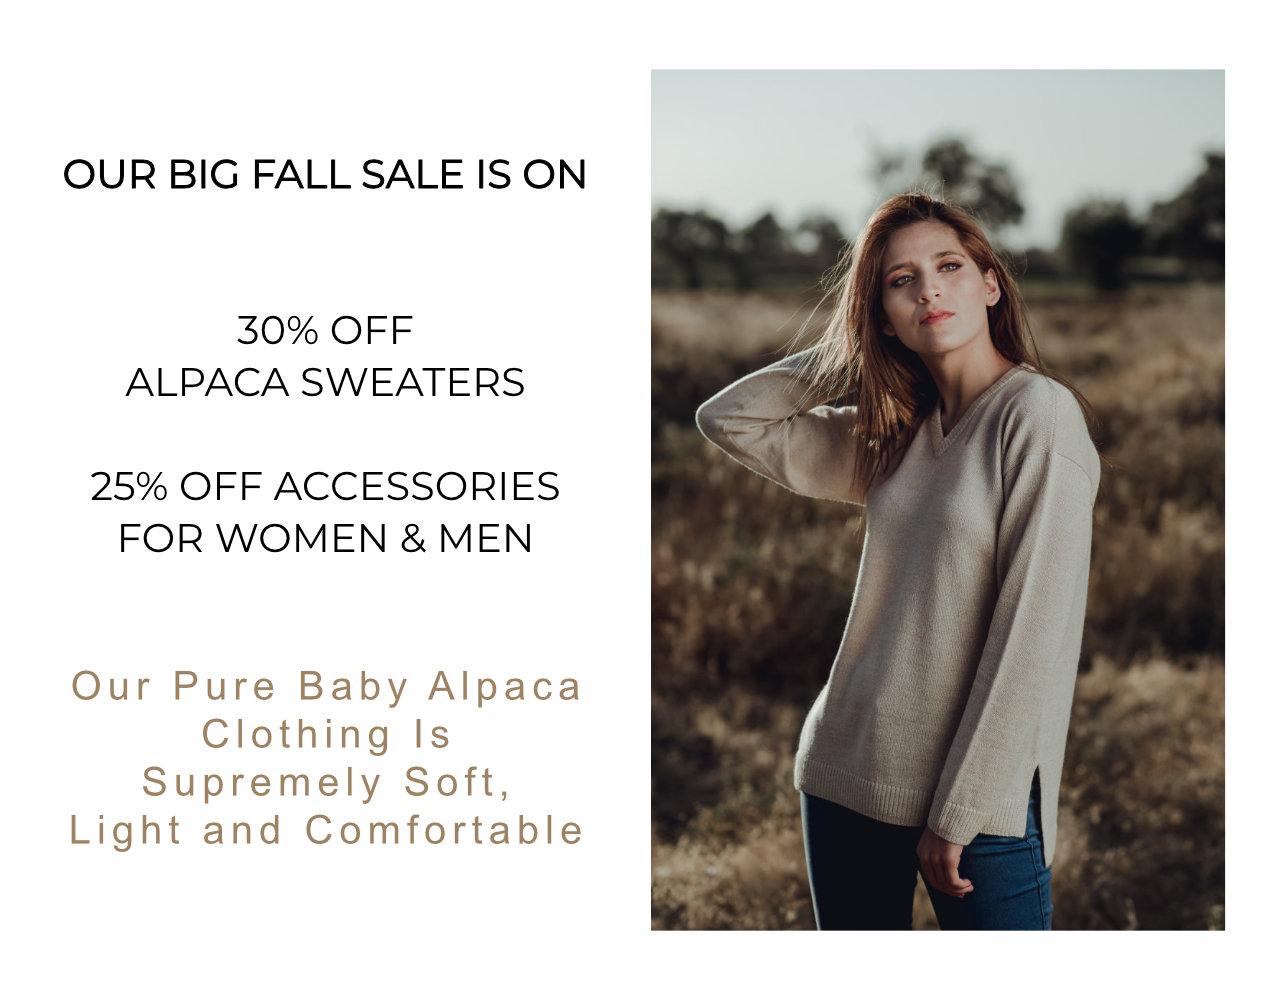 30% off alpaca sweaters for women and men. 25% off alpaca accessories for women and men